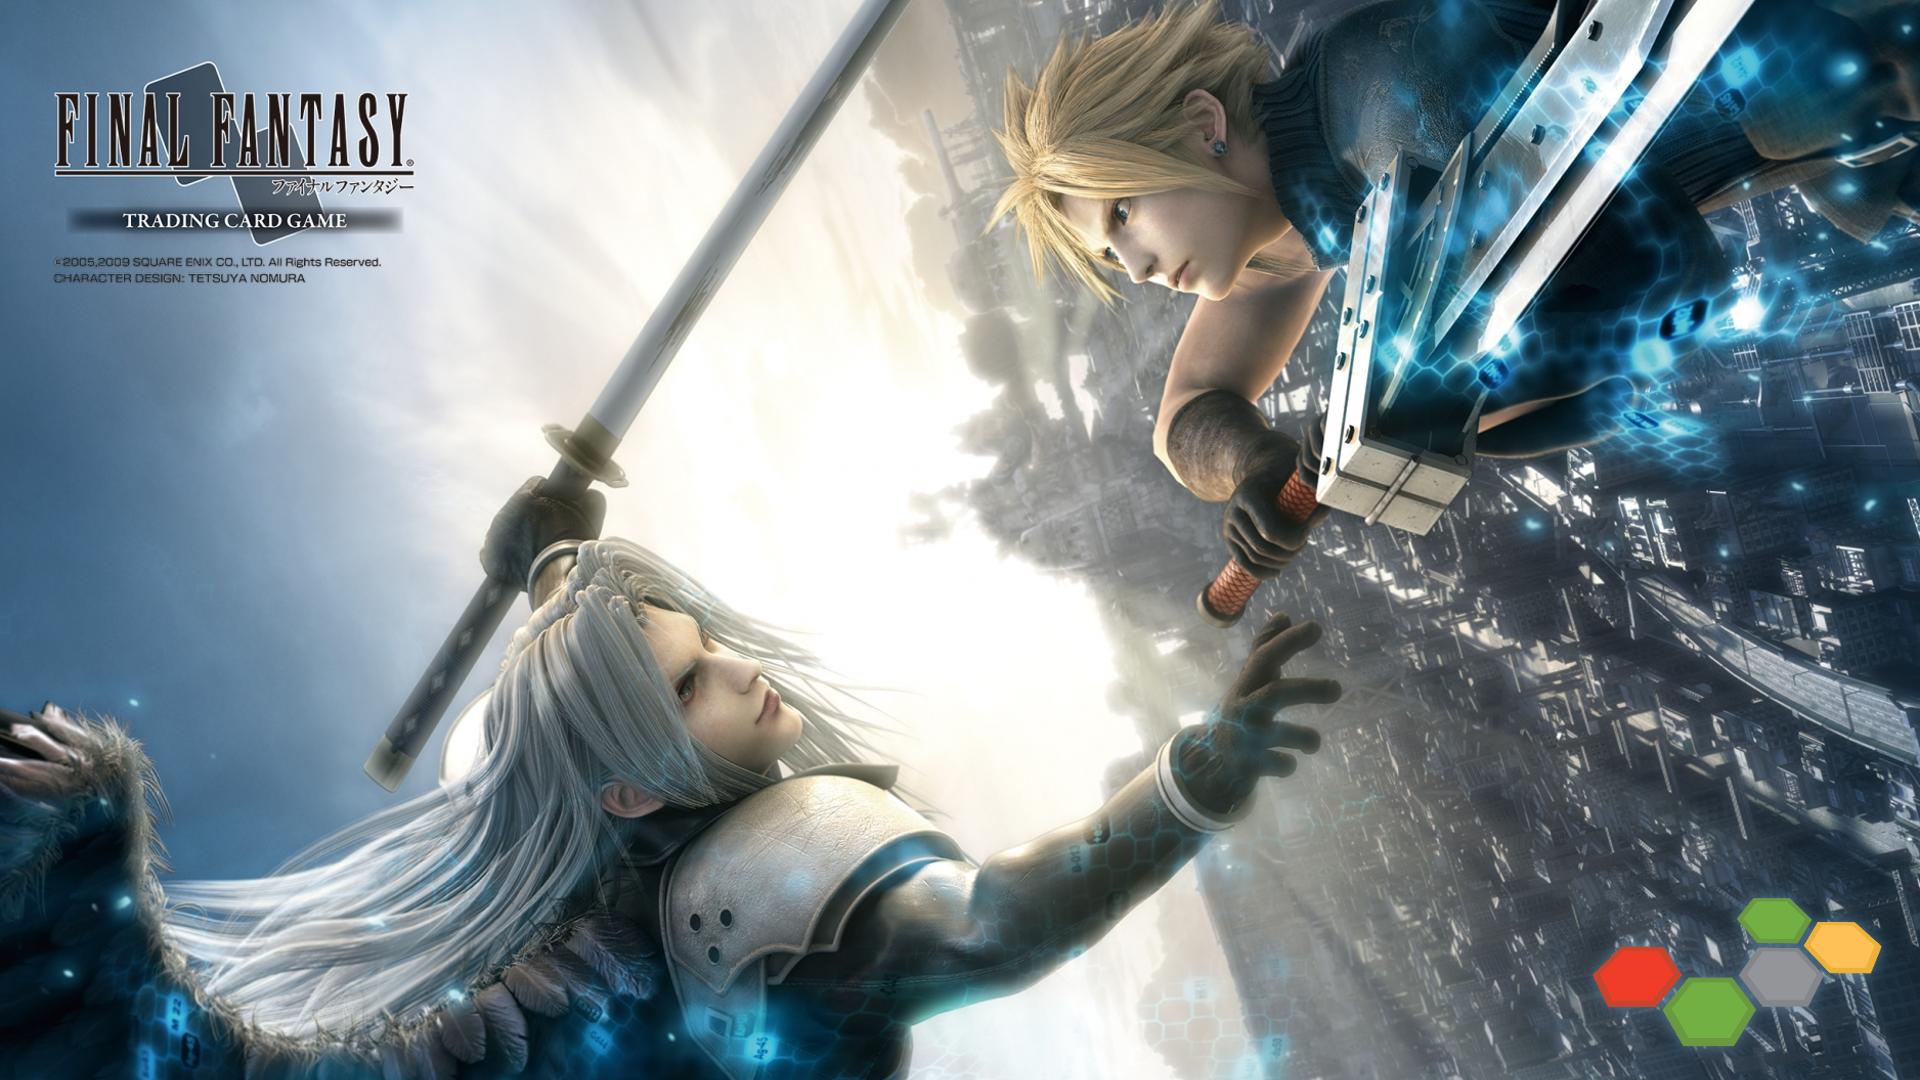 Final Fantasy TCG Event Image.png